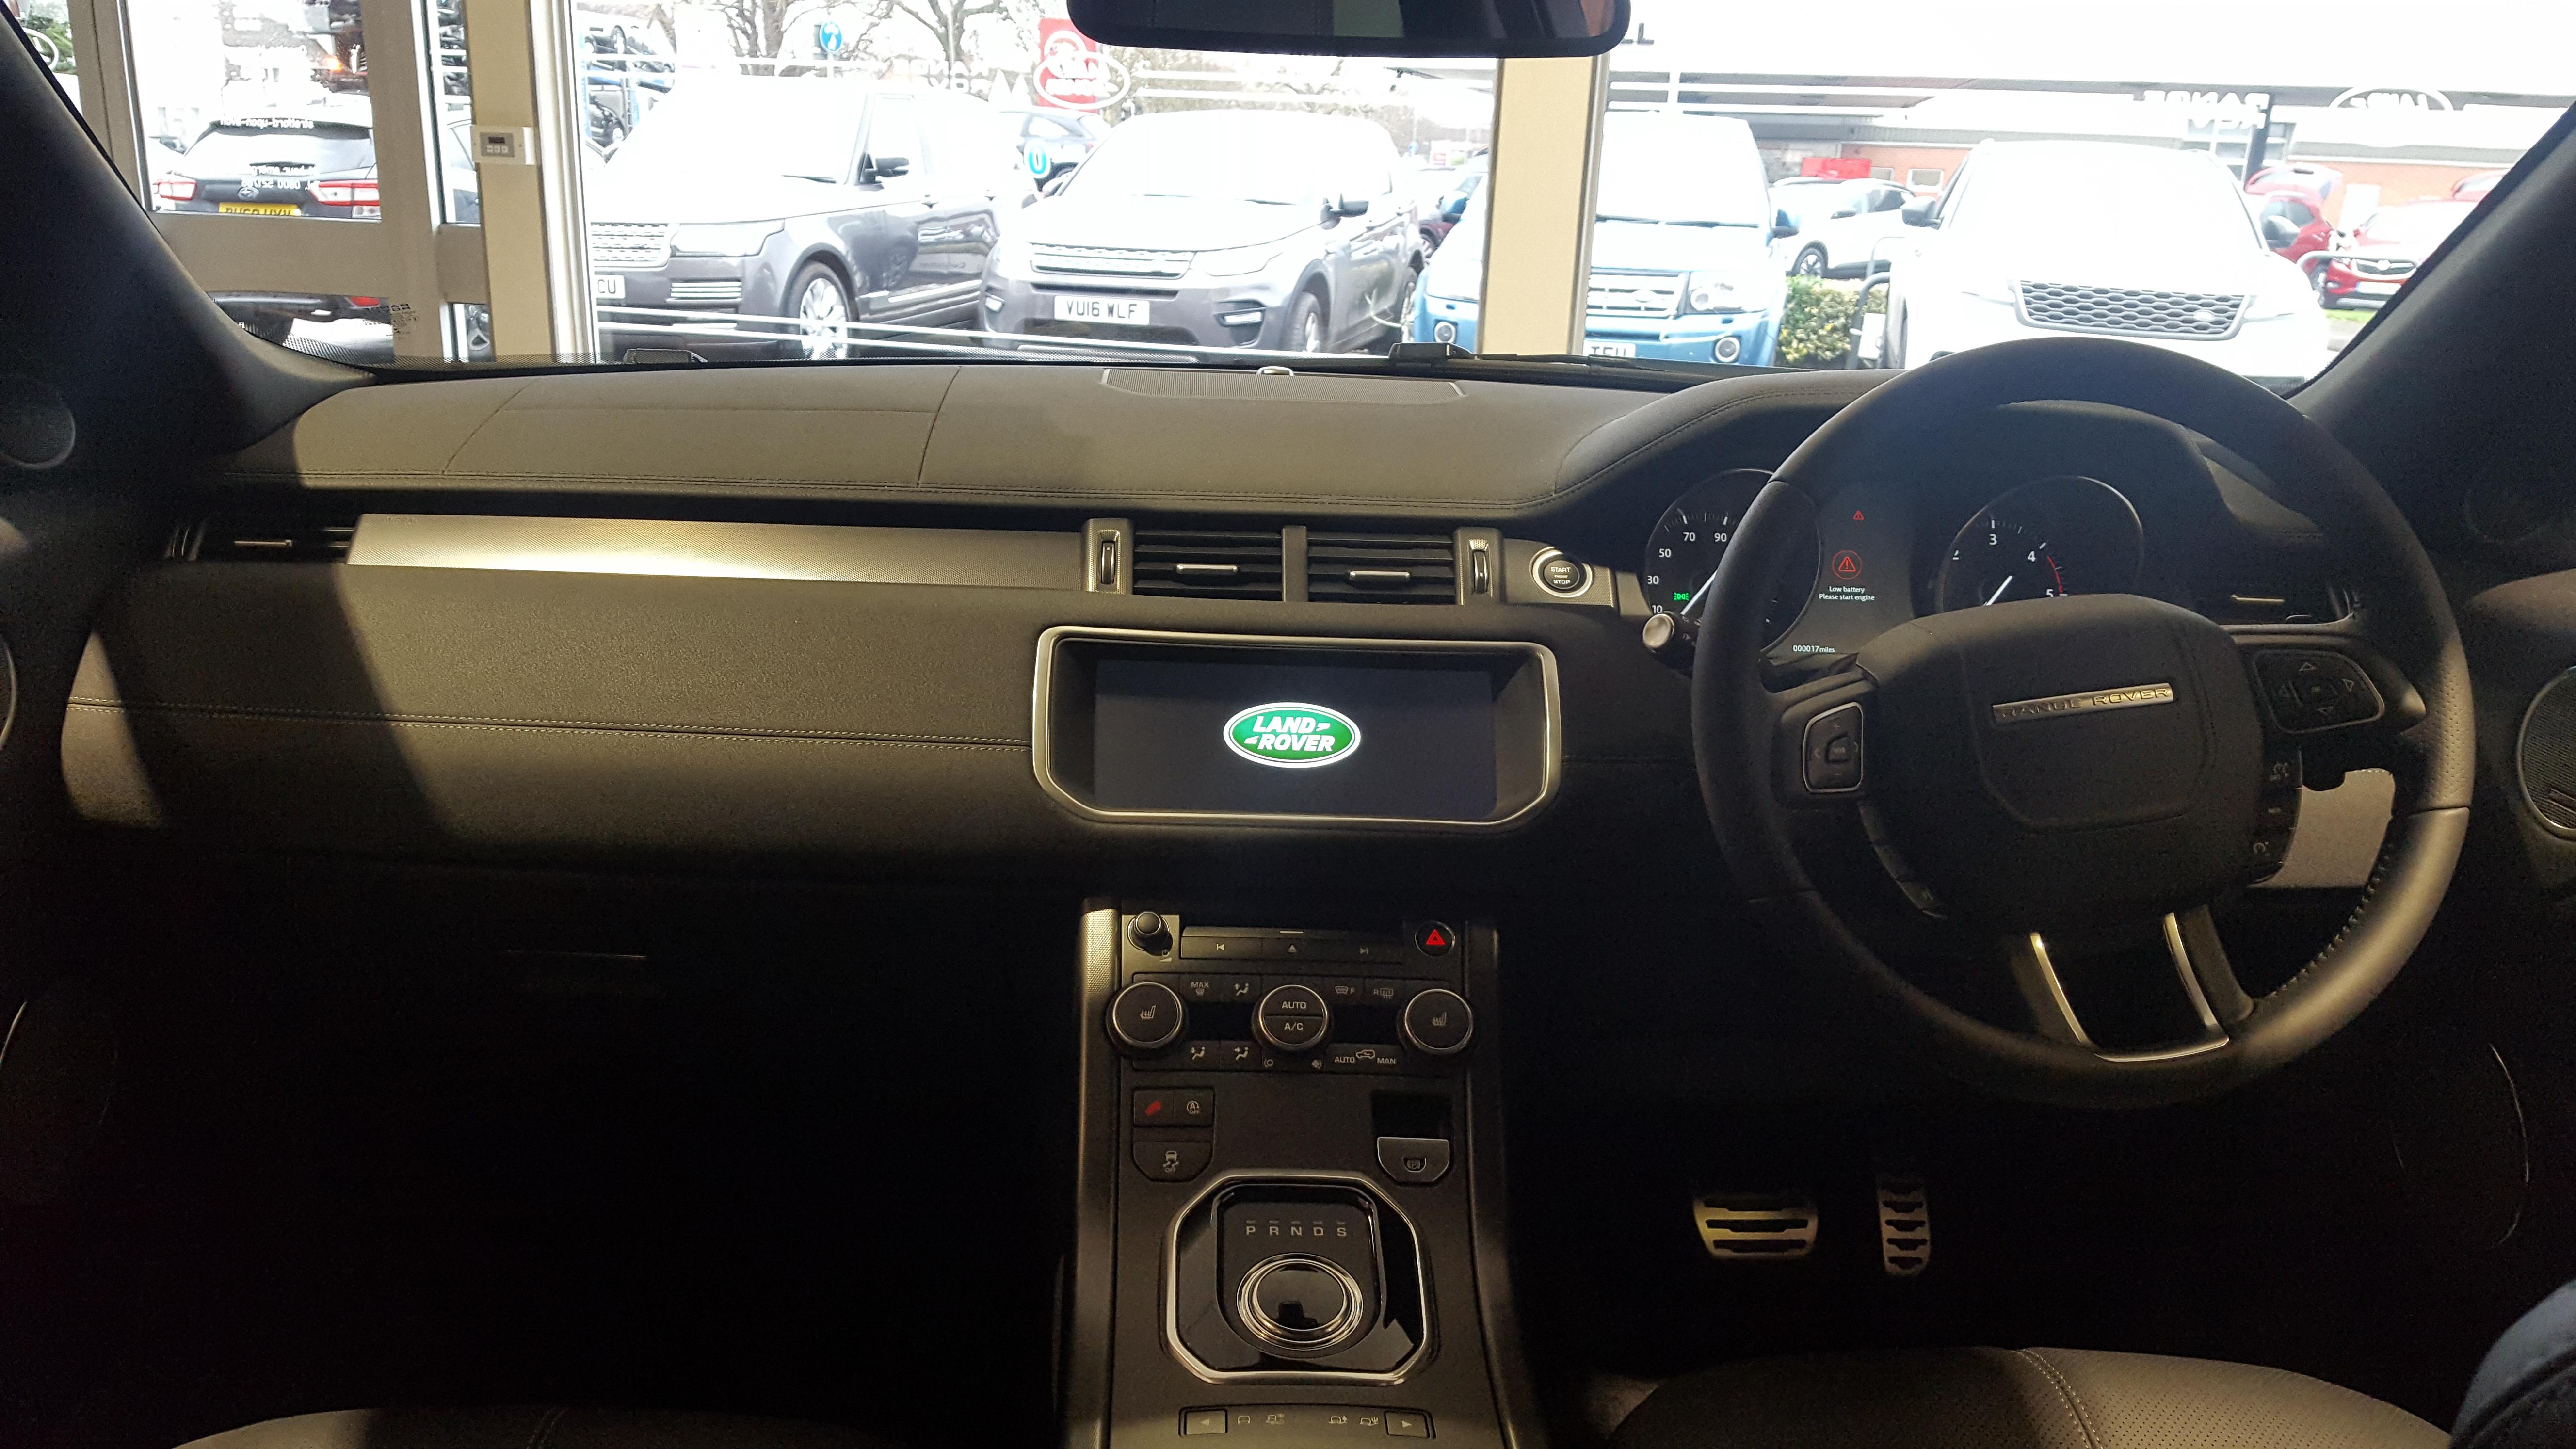 Range Rover Evoque Interior >> File 2018 Land Rover Range Rover Evoque Hse Interior Jpg